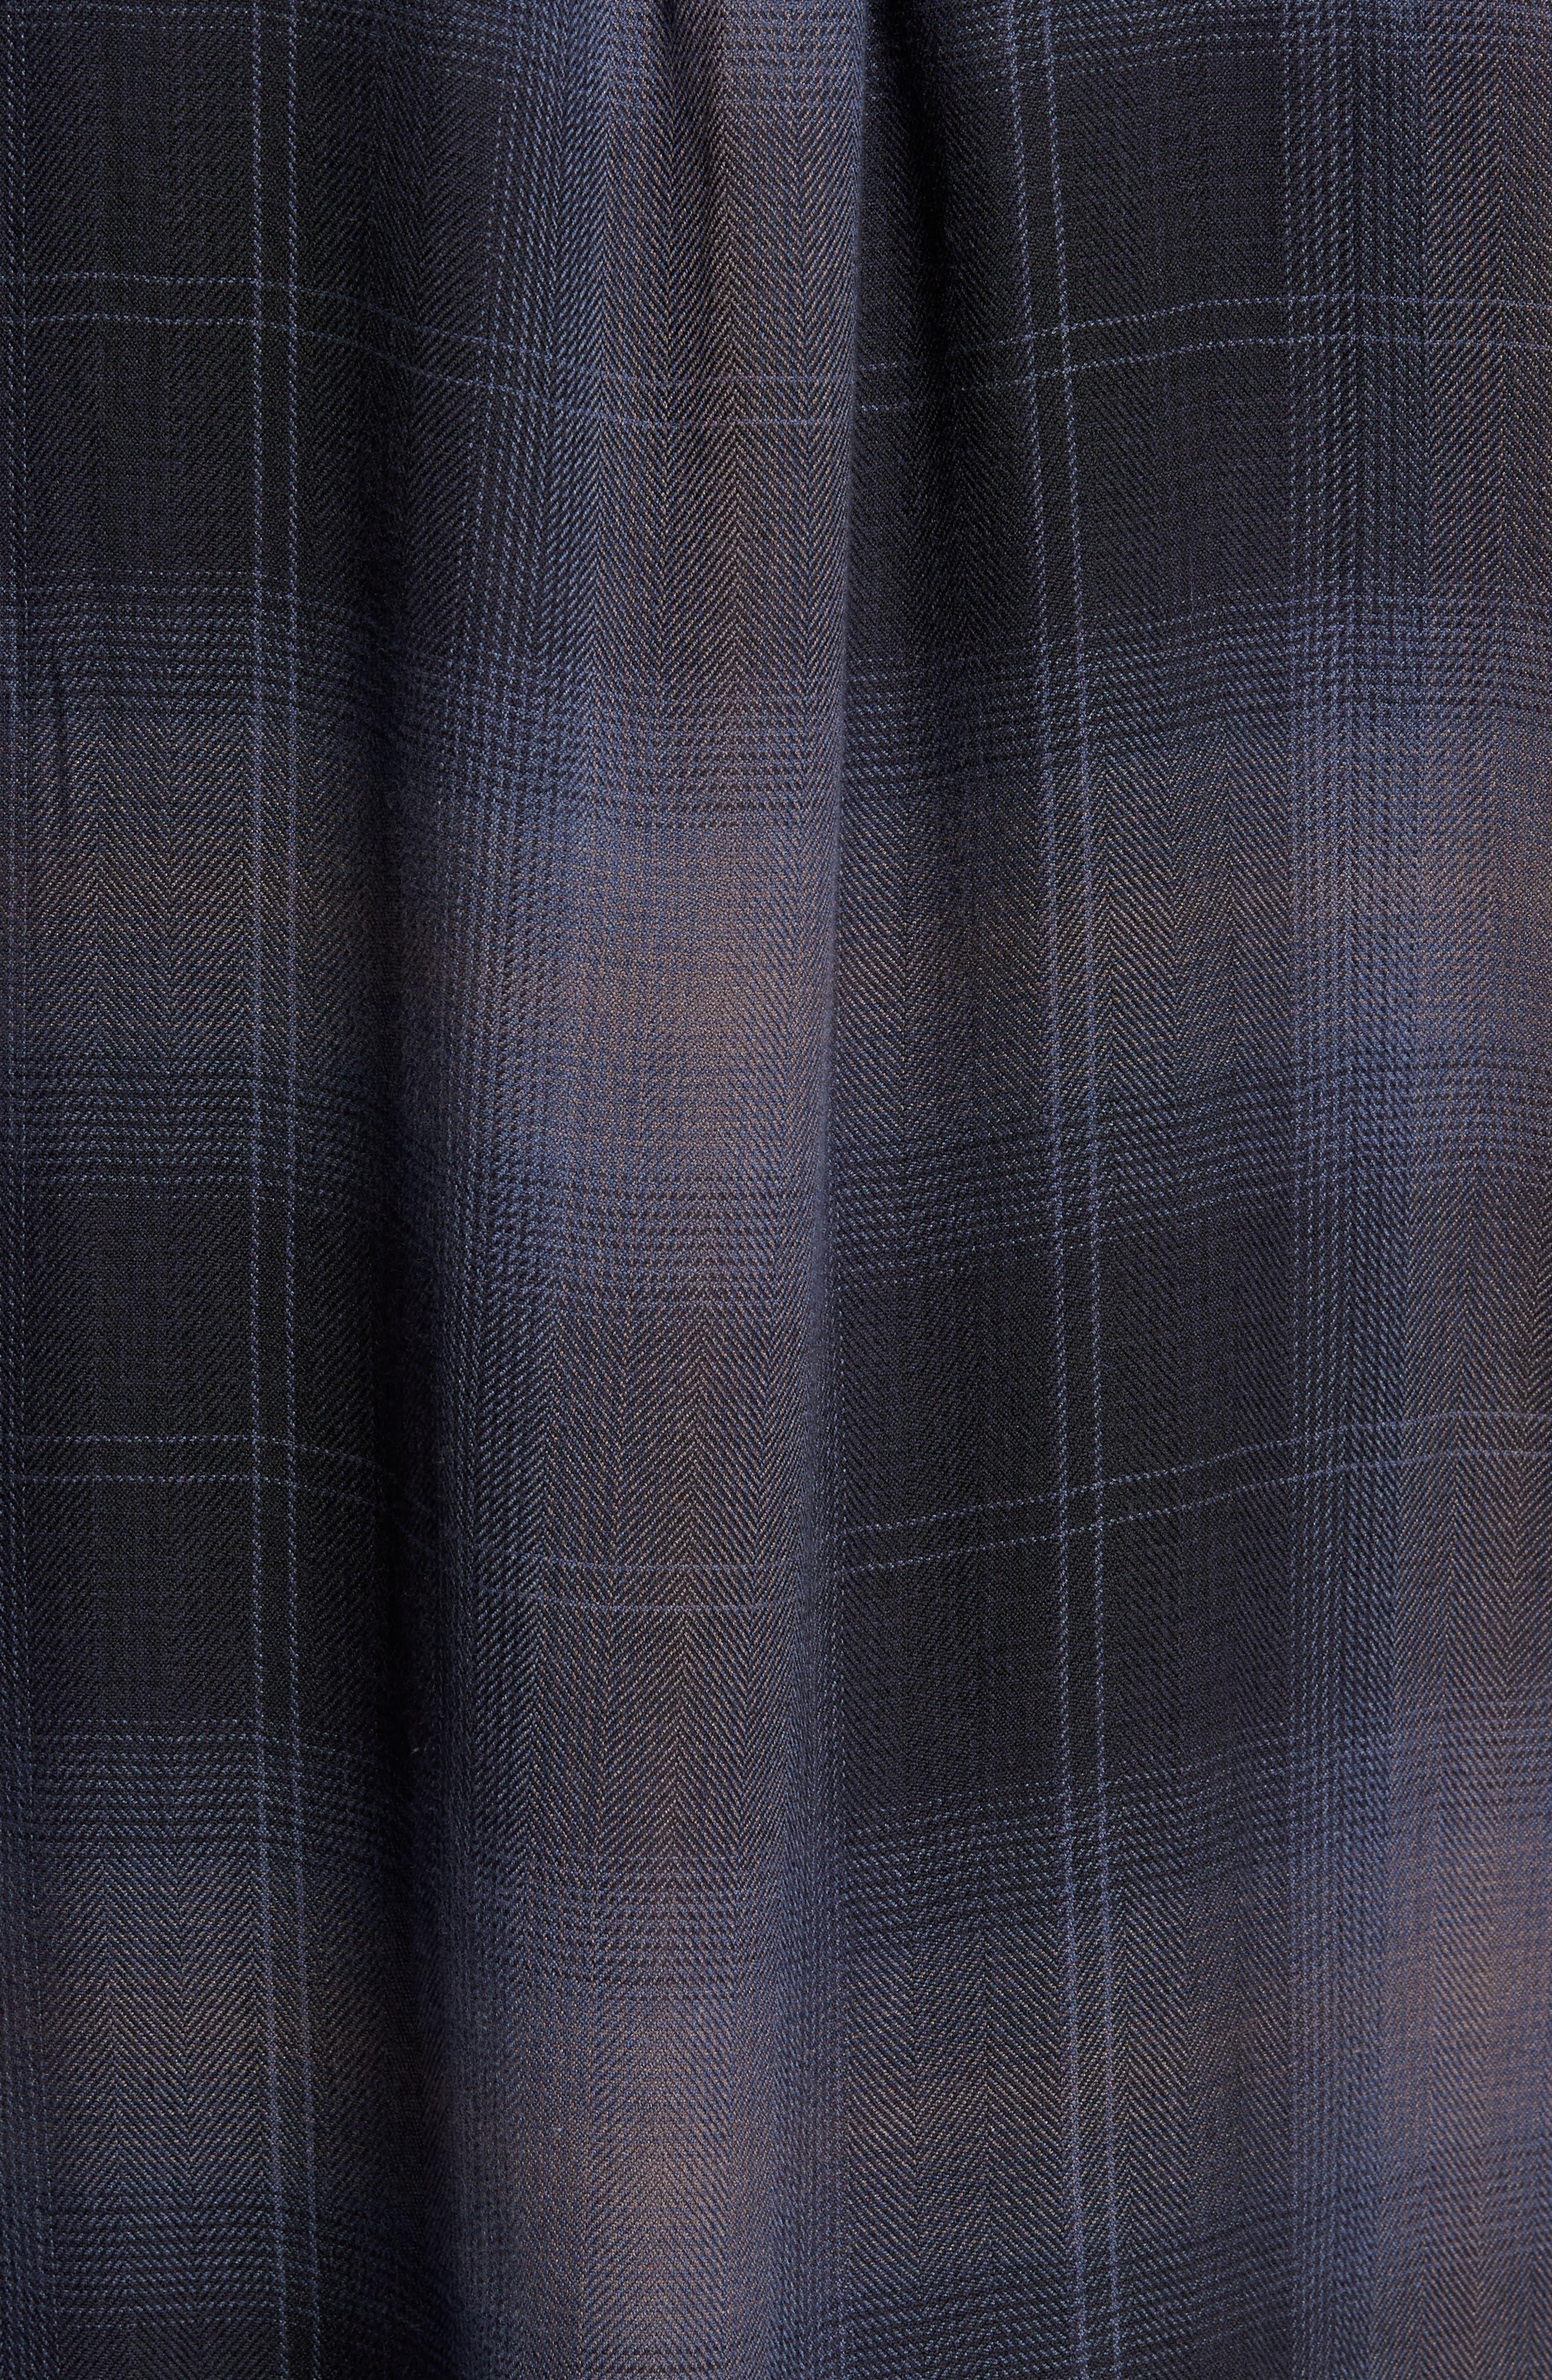 Lennox Sport Shirt,                             Alternate thumbnail 5, color,                             CHARCOAL/ BLACK